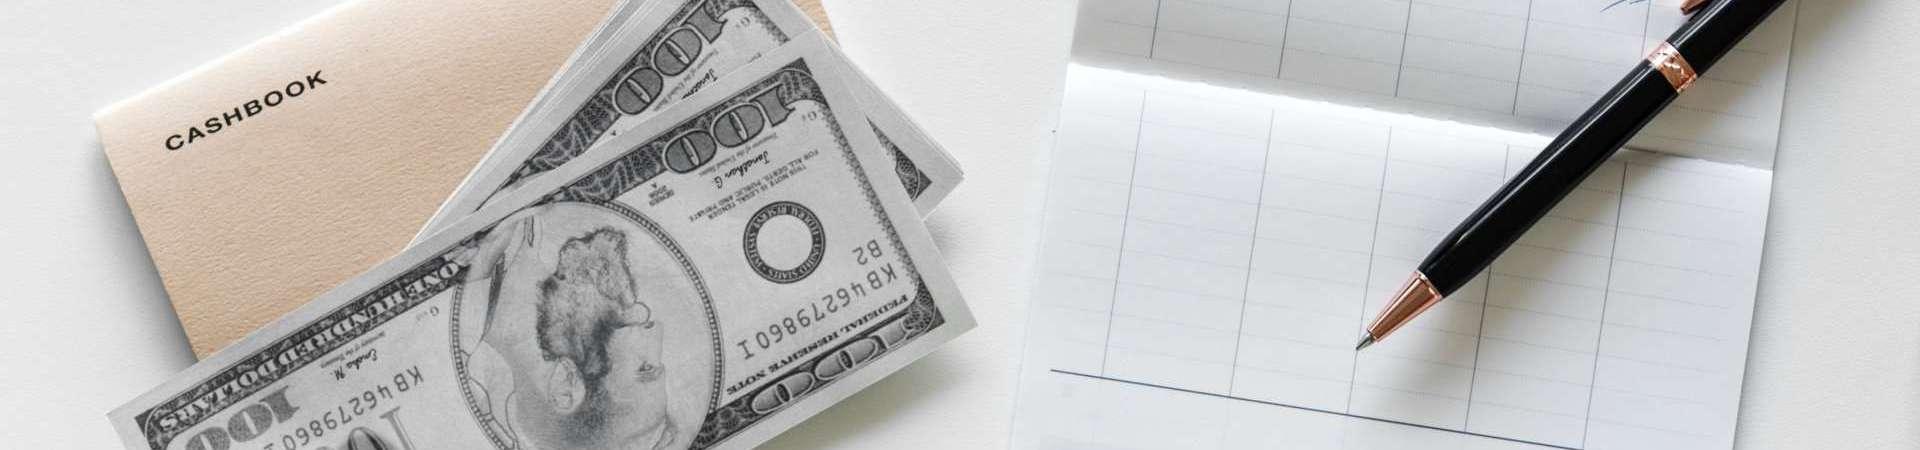 Emergency Savings: What You Need to Know   Savings Plan   Rainy Day Fund   #savings #moneymanagement #money #budgeting